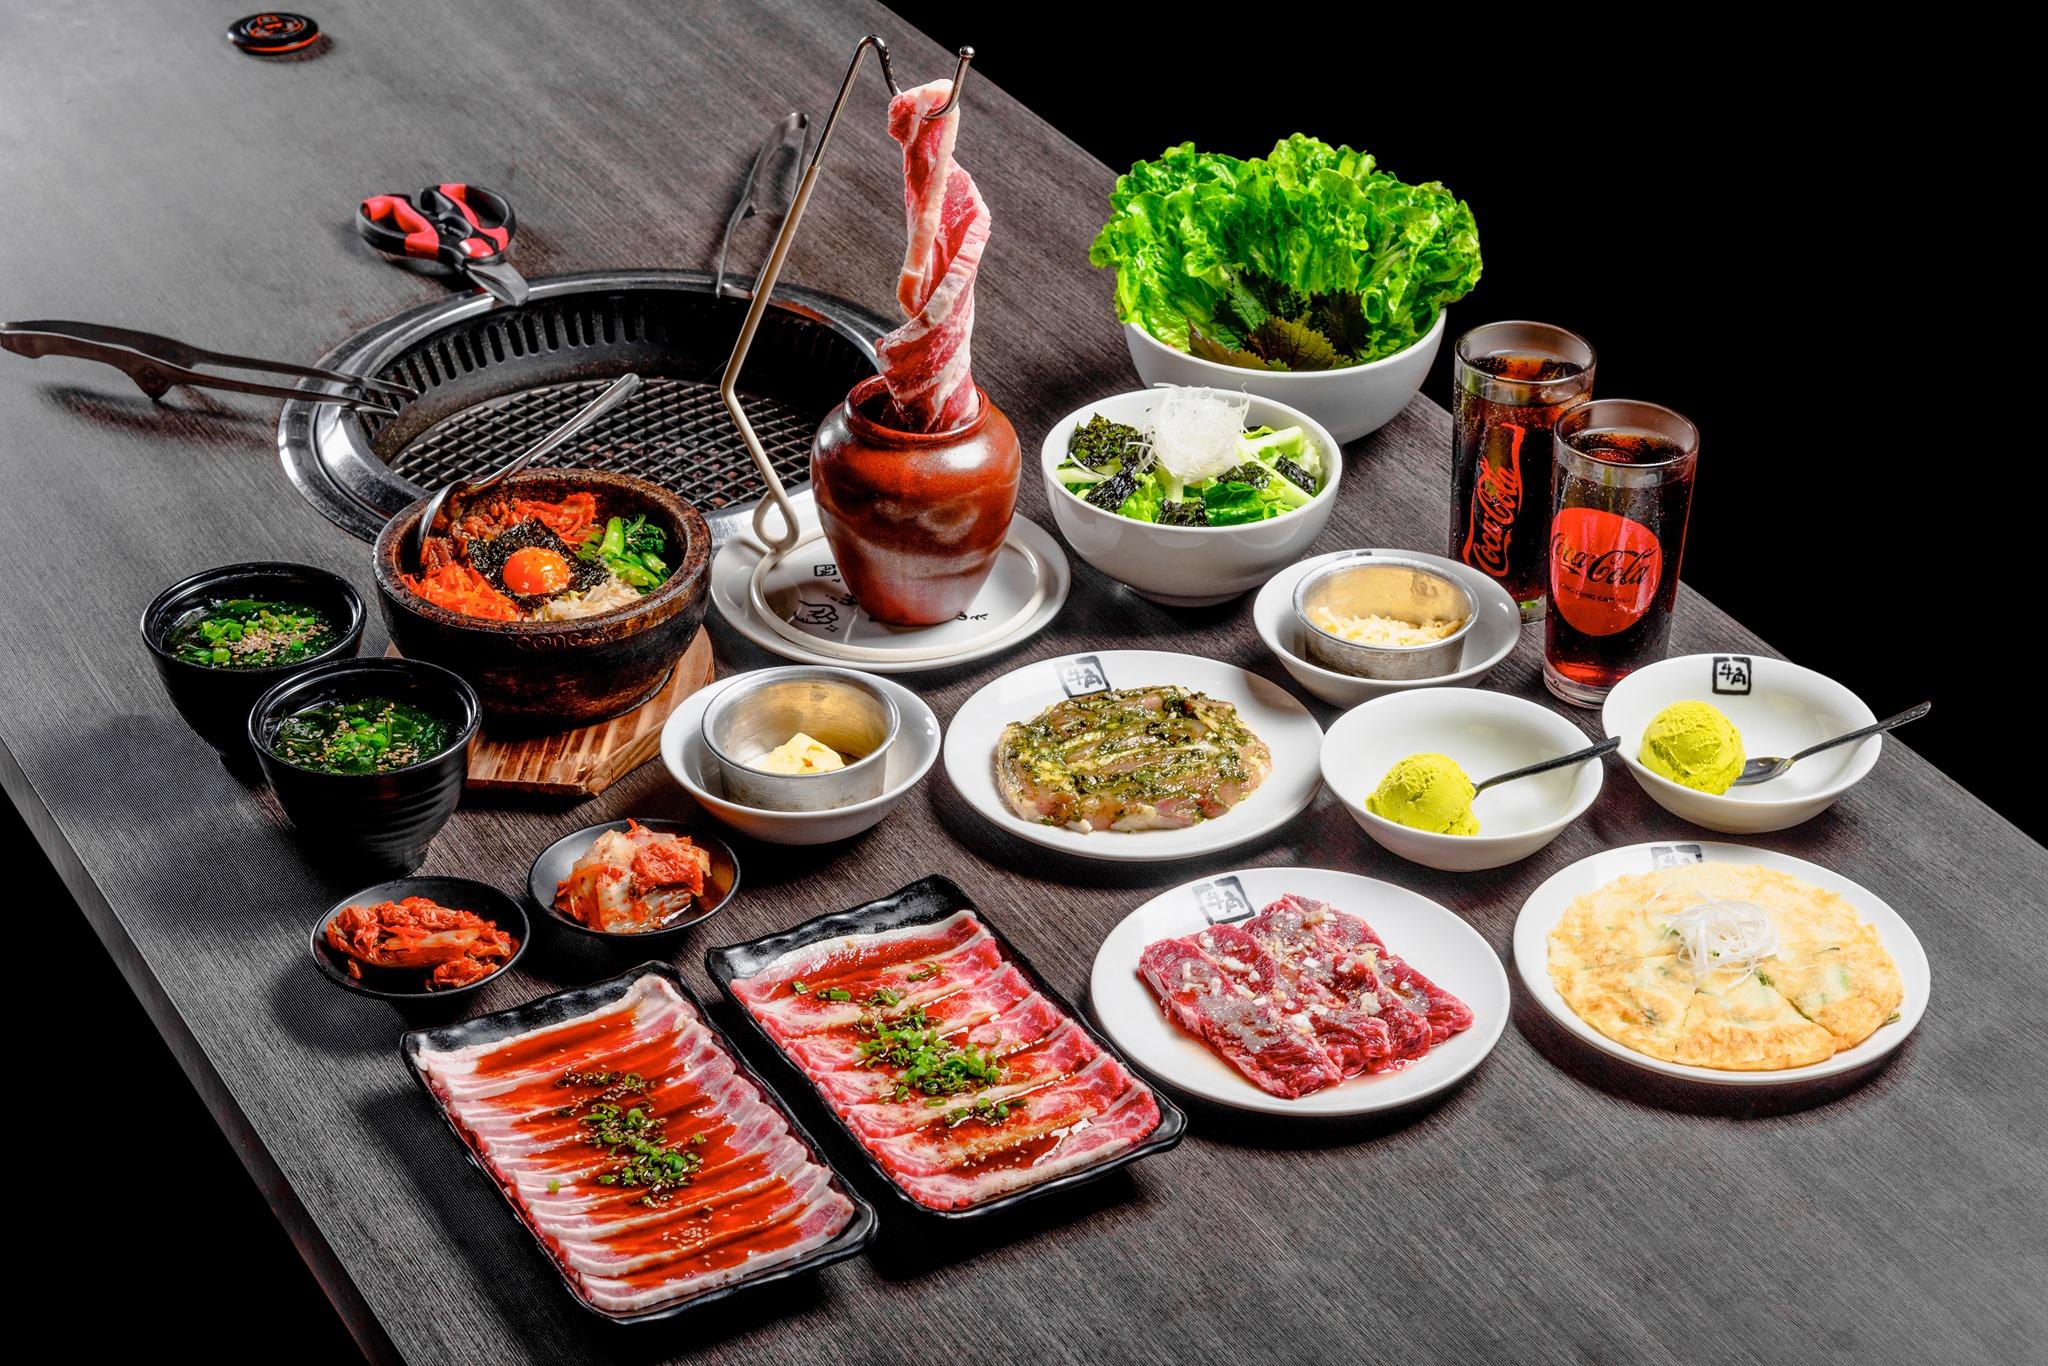 buffet-lau-nuong-tphcm